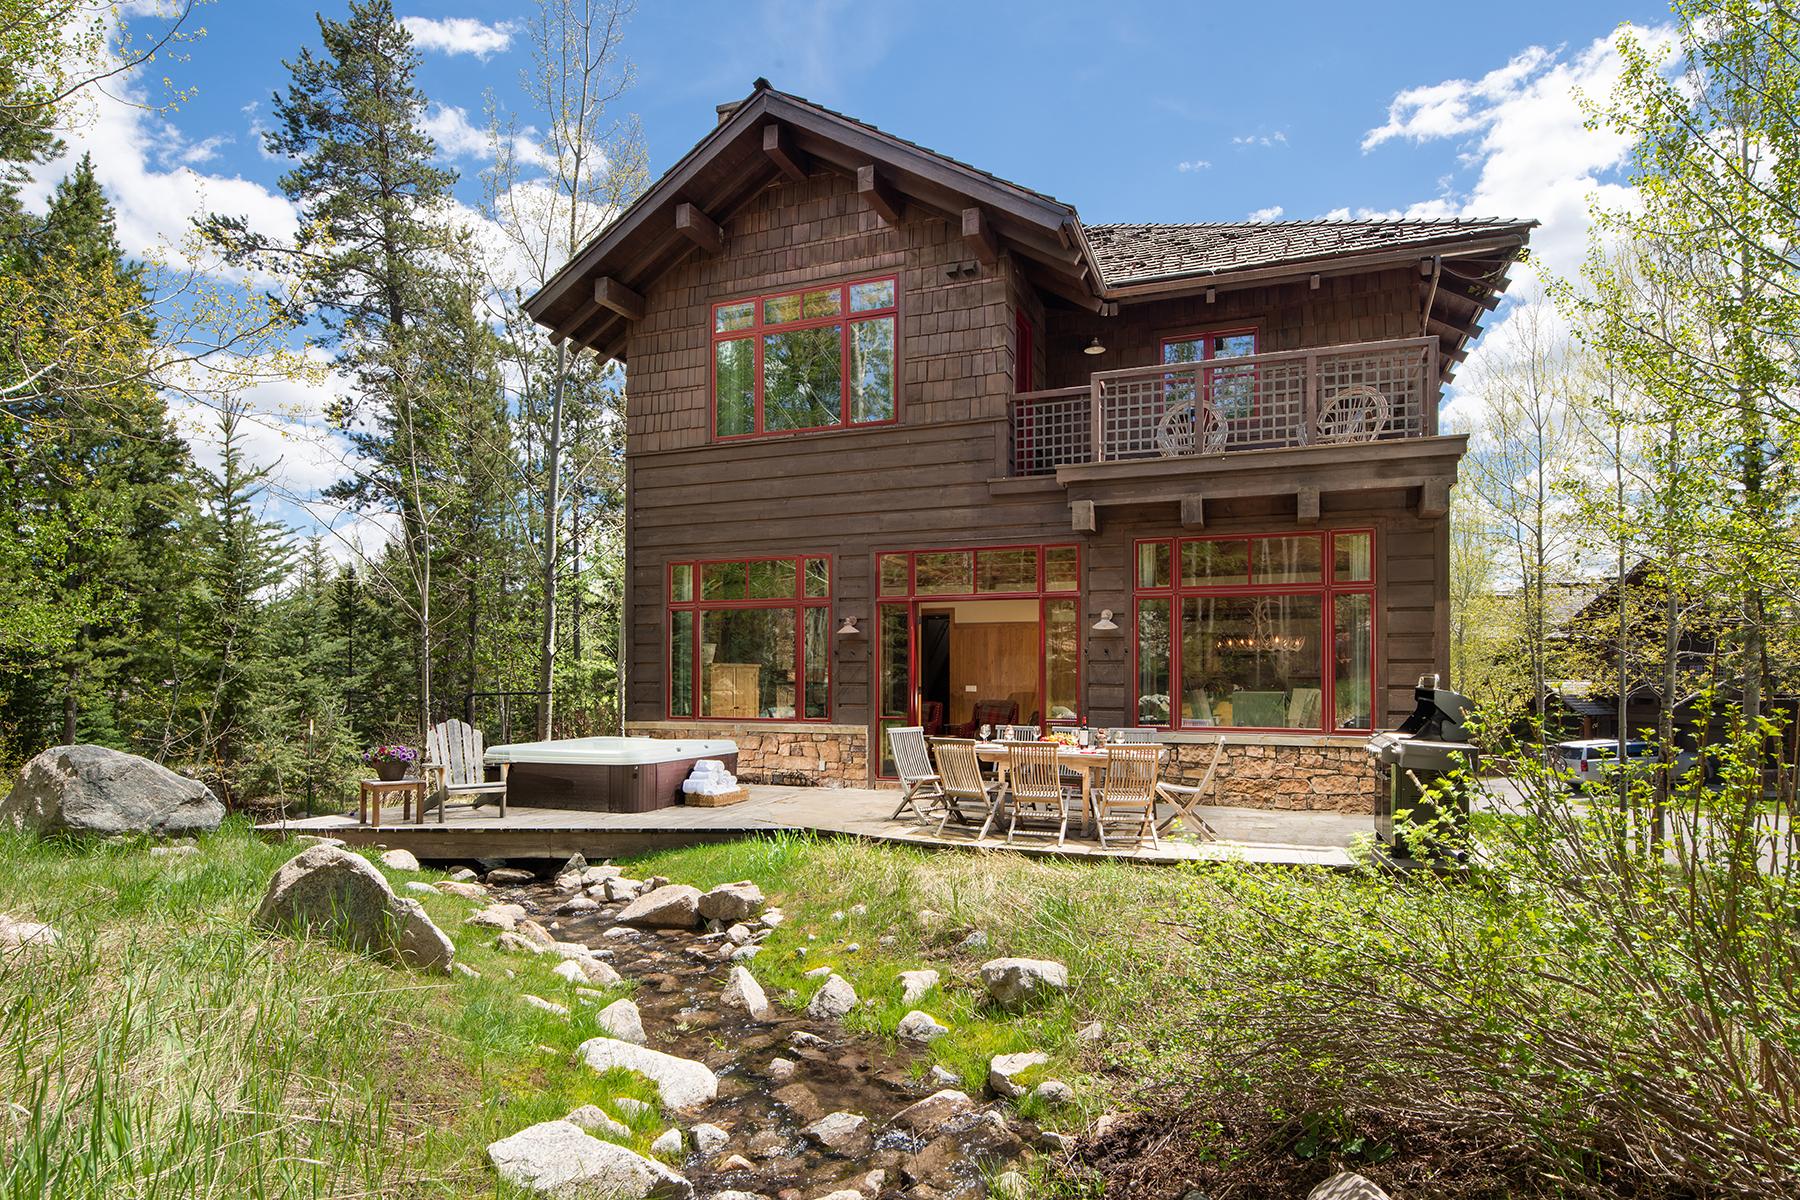 Single Family Homes pour l Vente à Ski-in, Ski-Out Home 3193 W Washakie Rd, Teton Village, Wyoming 83025 États-Unis